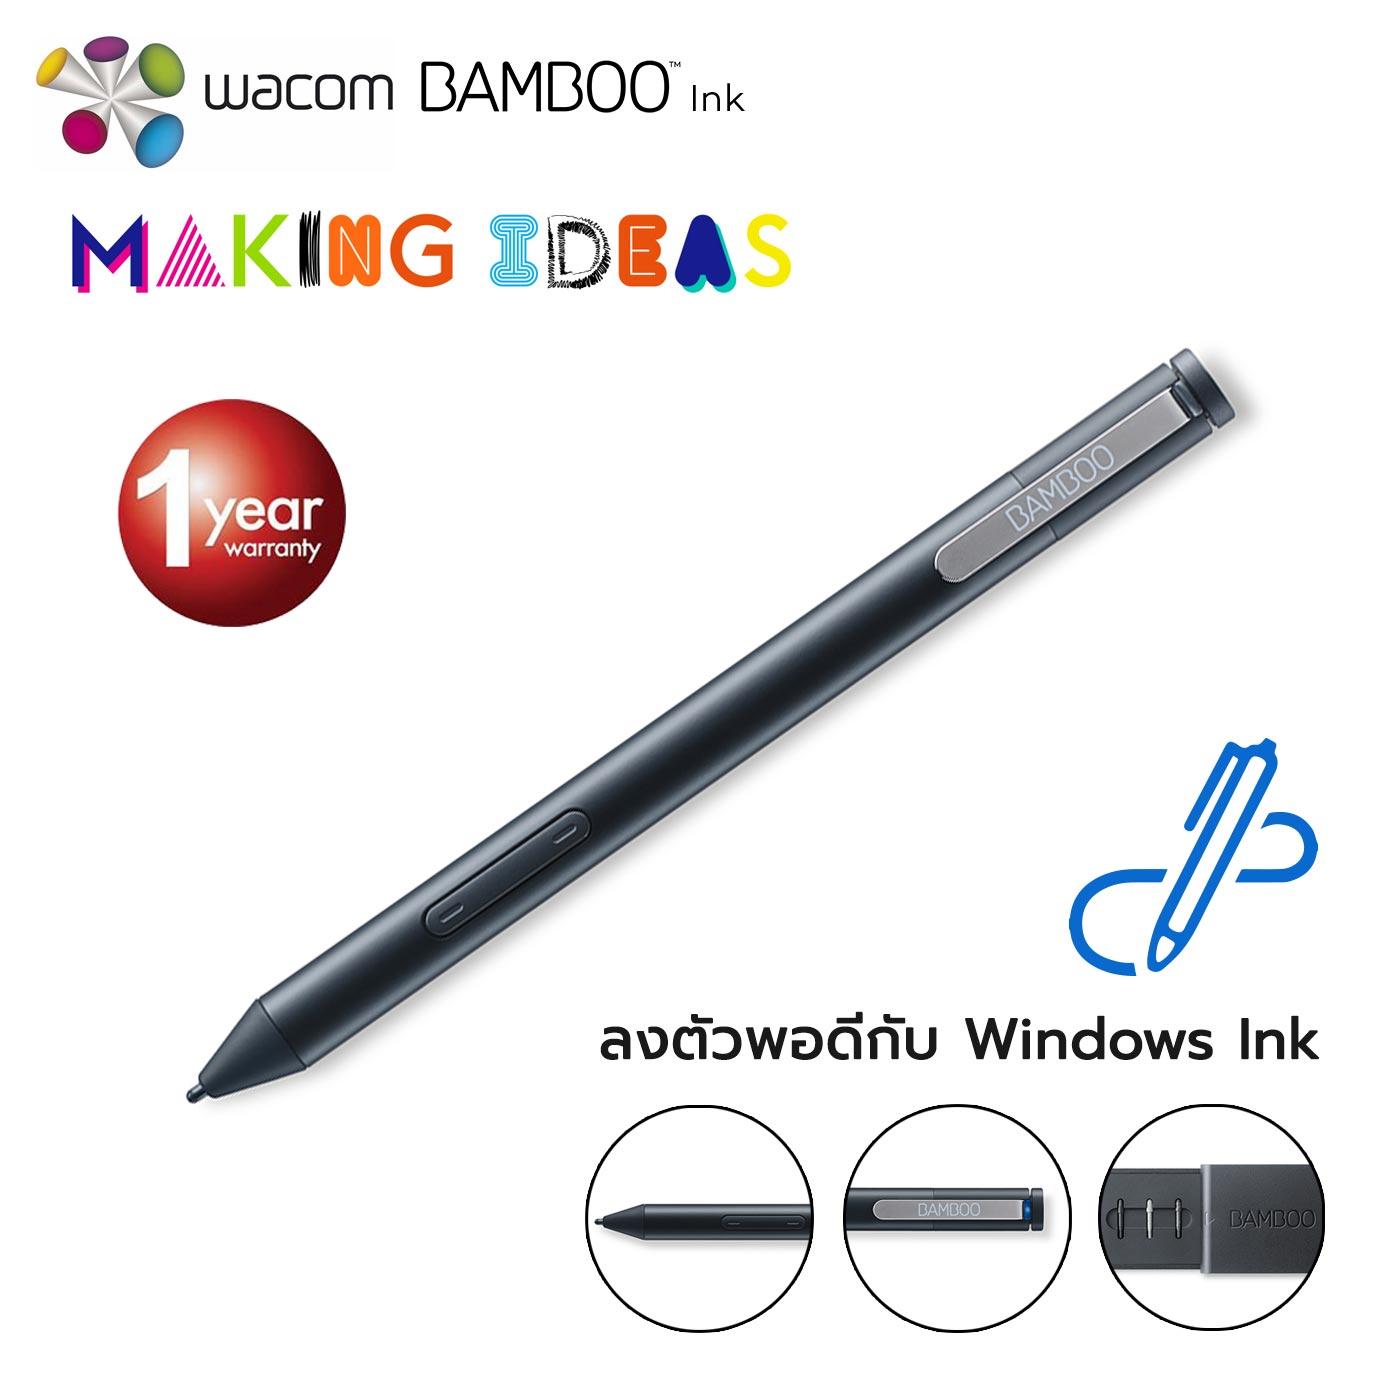 Wacom Bamboo Ink for windows 10 (CS321AK) - Black